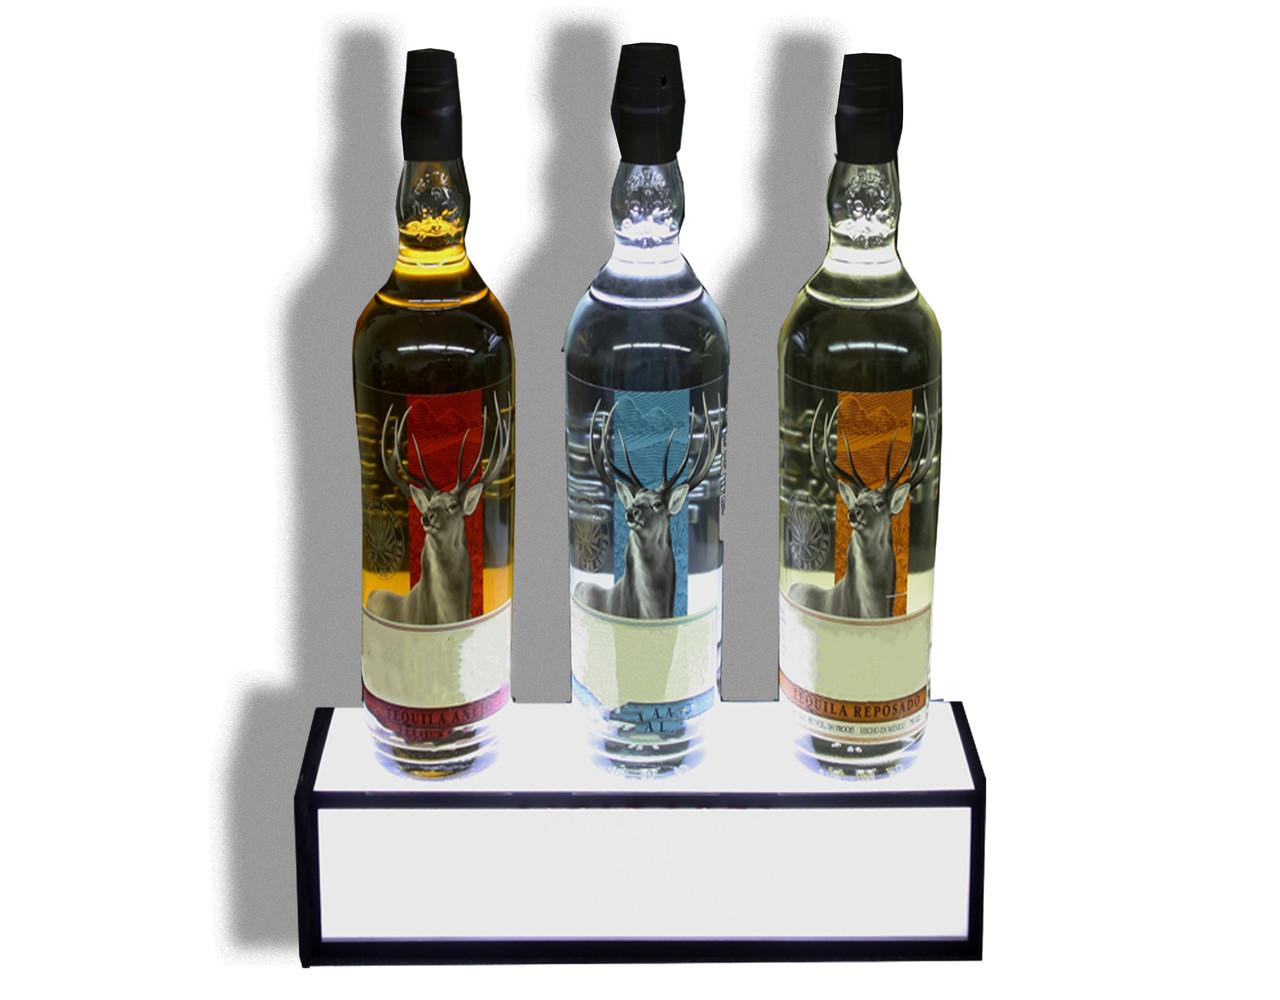 POS, Point of Sale, display, Liquor, Spirits, beer, Rep, Southern, Wine, Bar,Nightclub, Liquor store